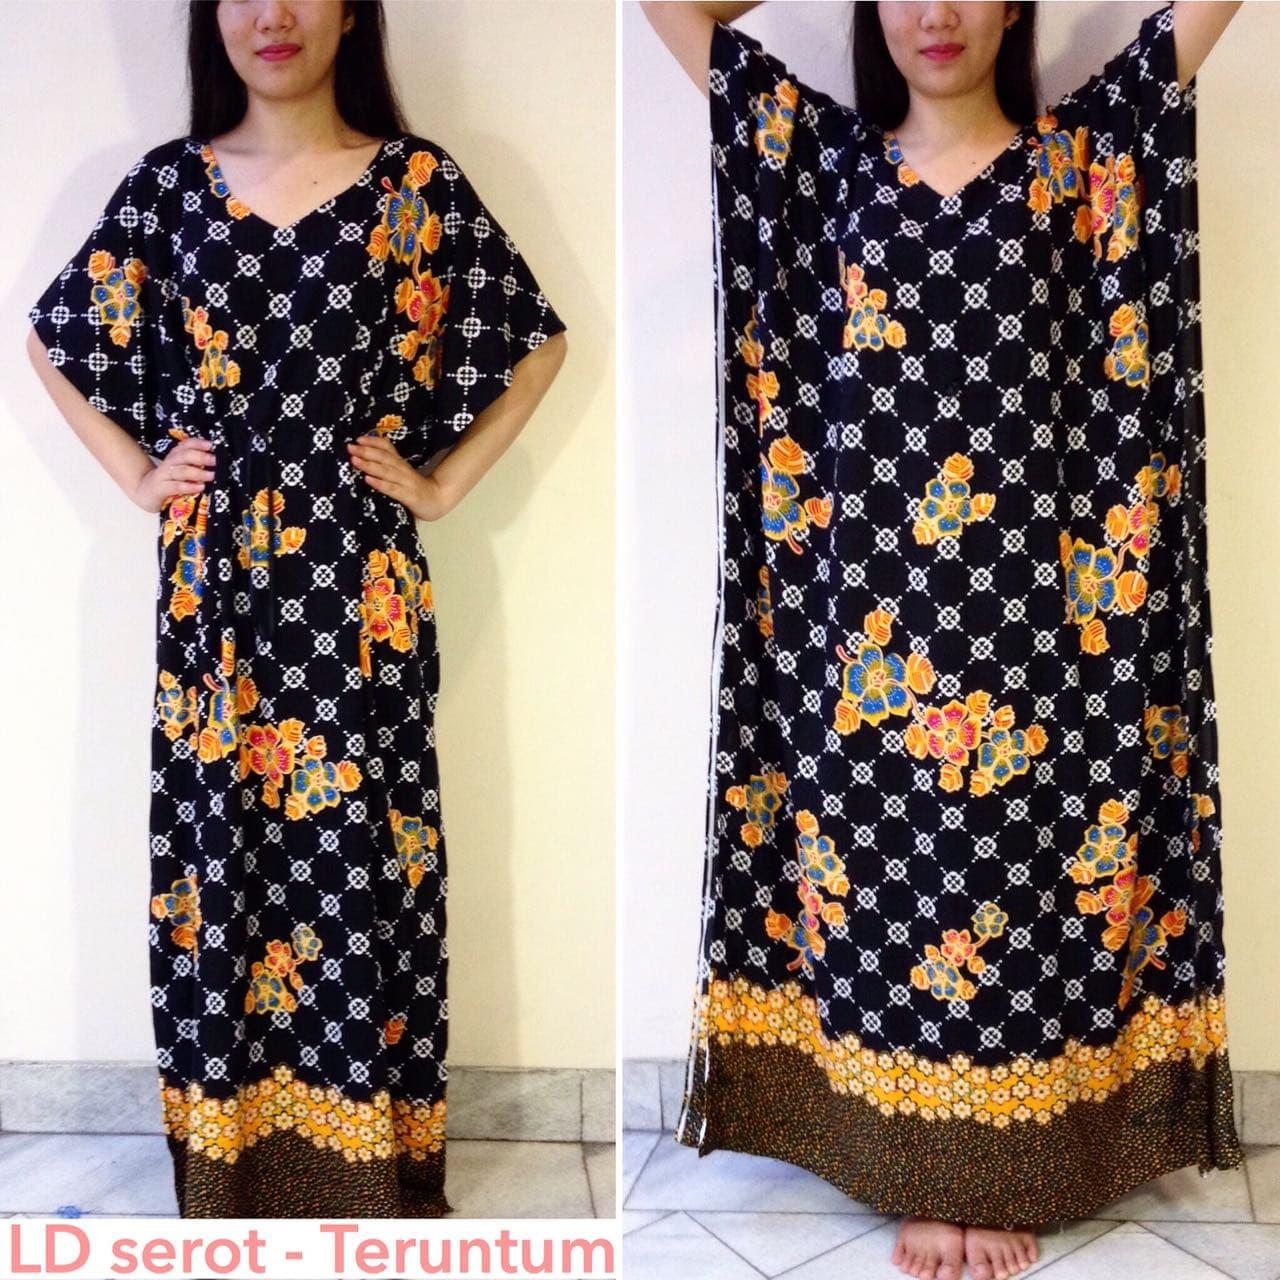 Batik Hengky - LD serot Teruntum - Baju Tidur Wanita Dress Daster